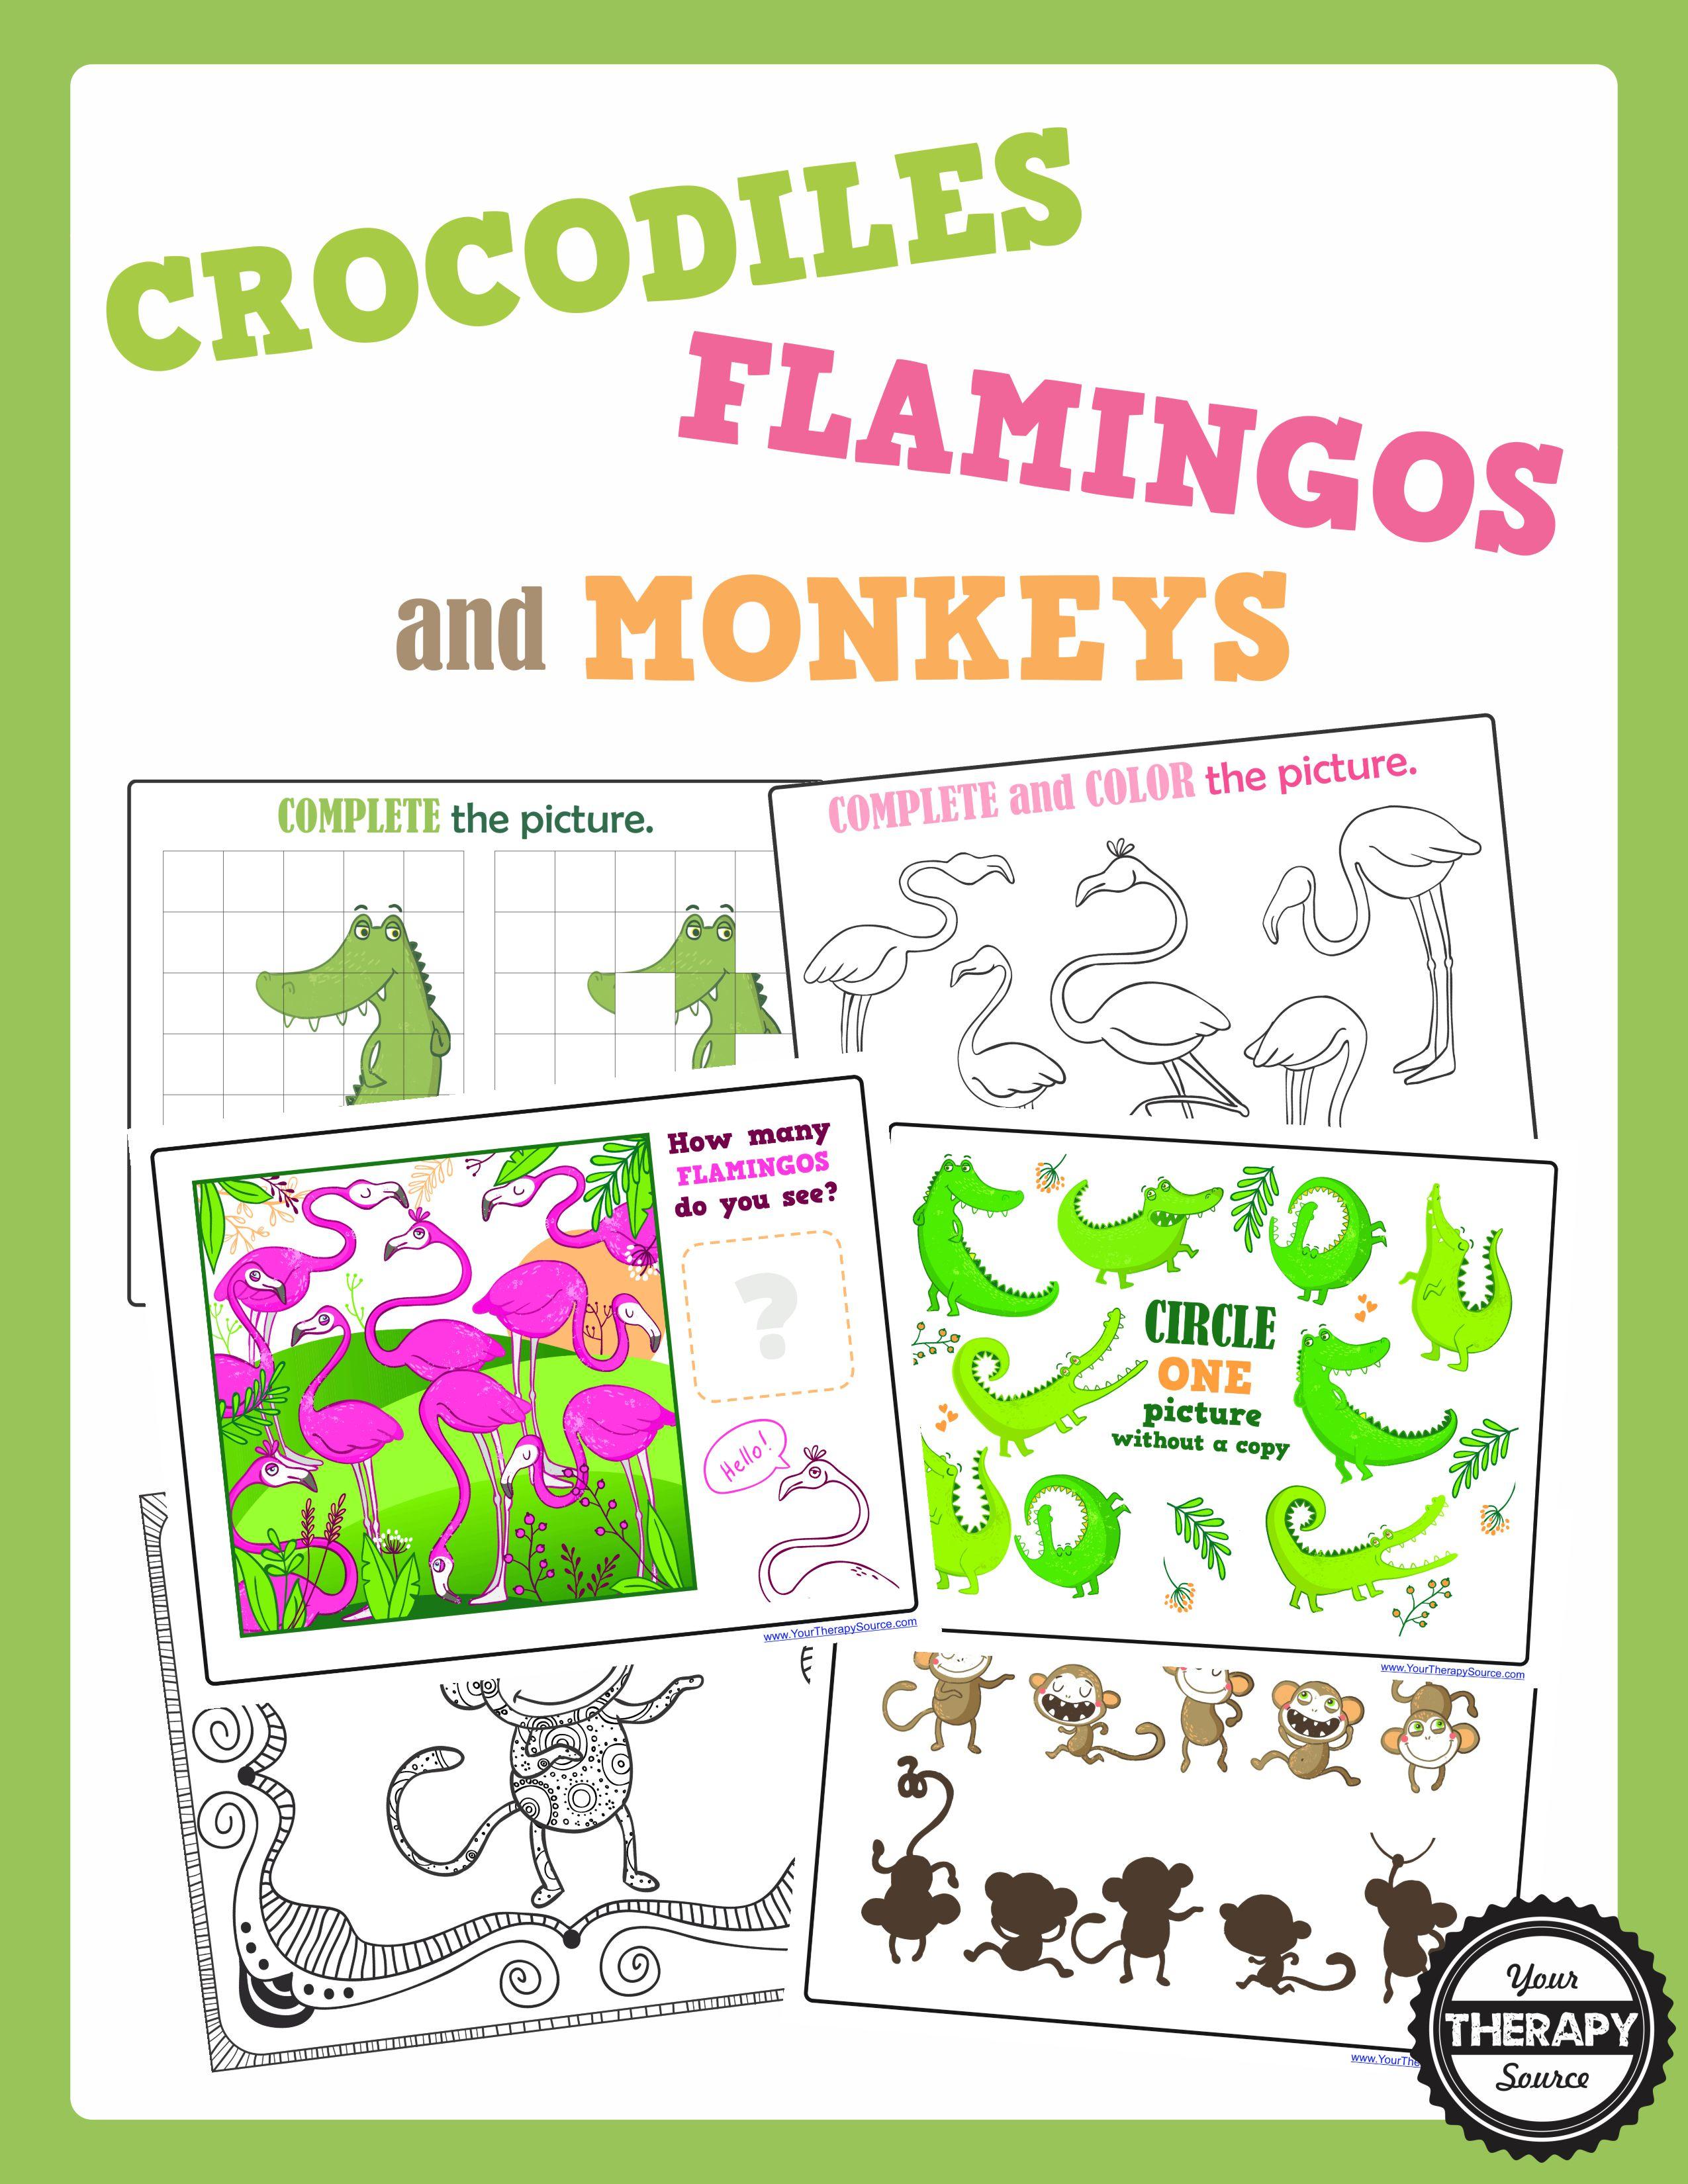 Crocodiles, Flamingos and Monkeys